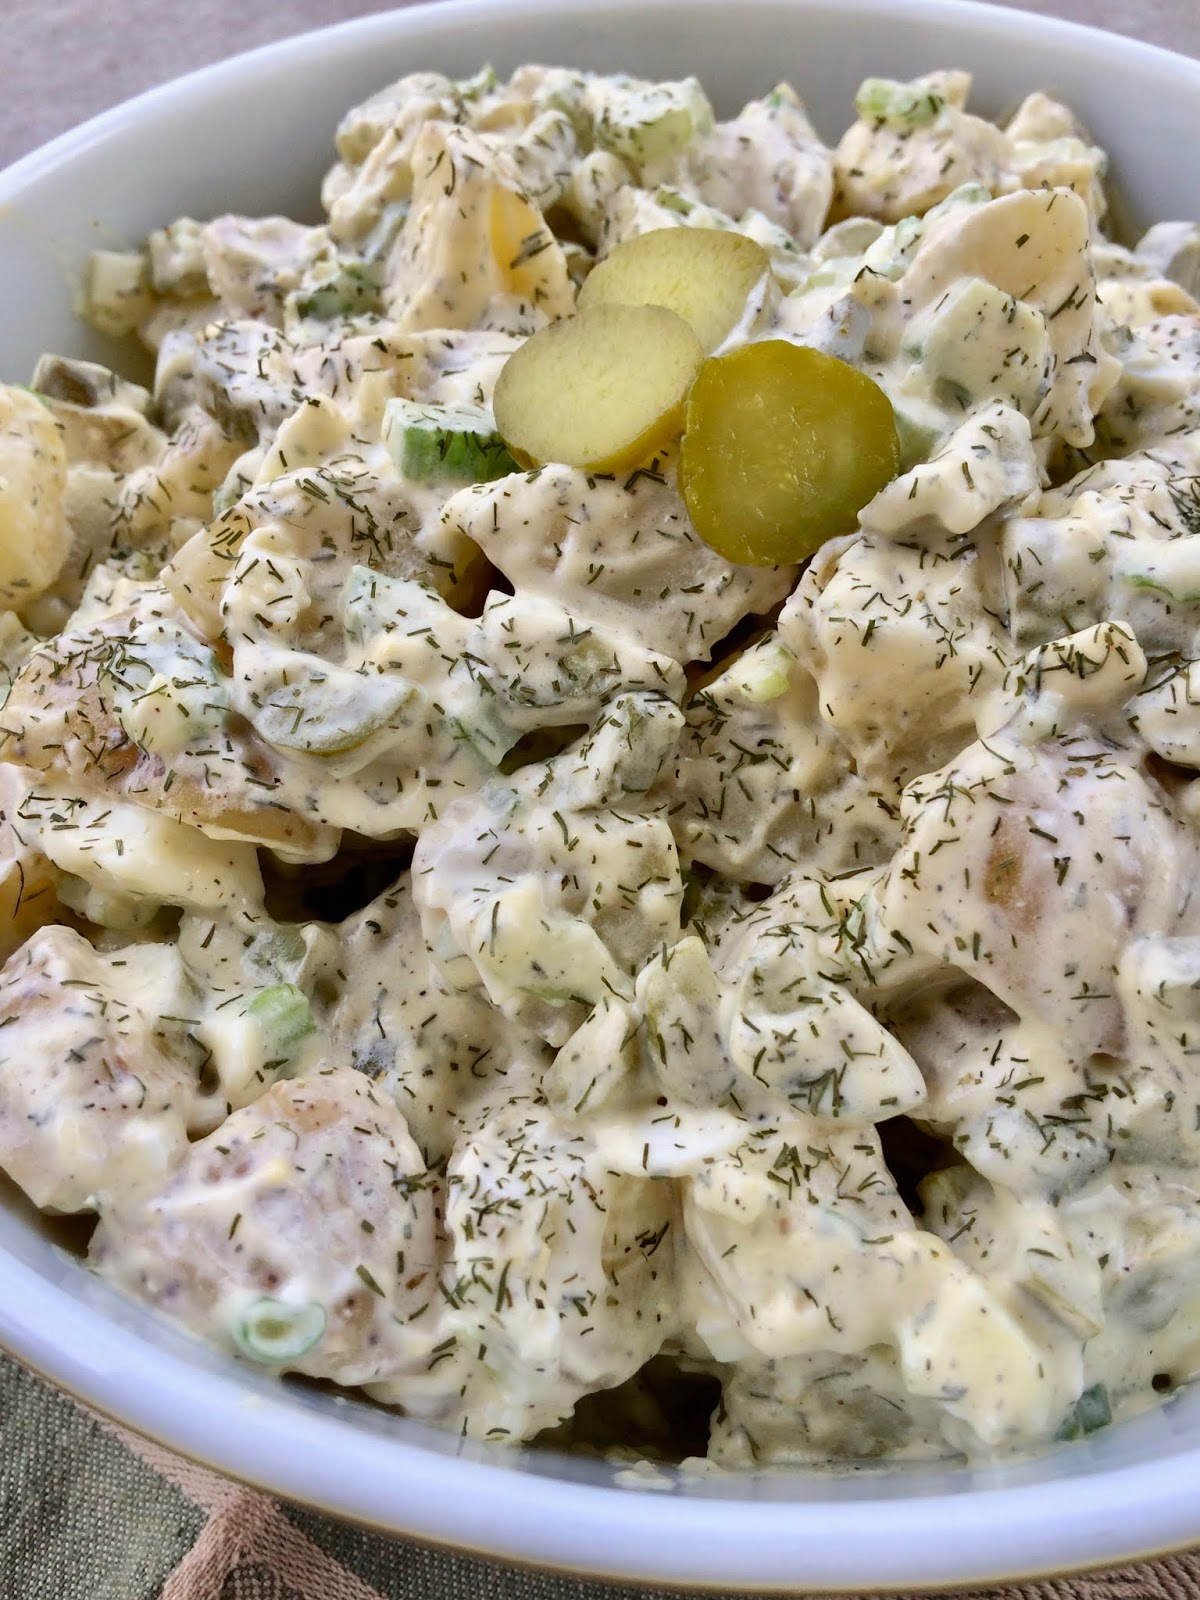 Potato Salad Recipe With Dill Pickle Juice